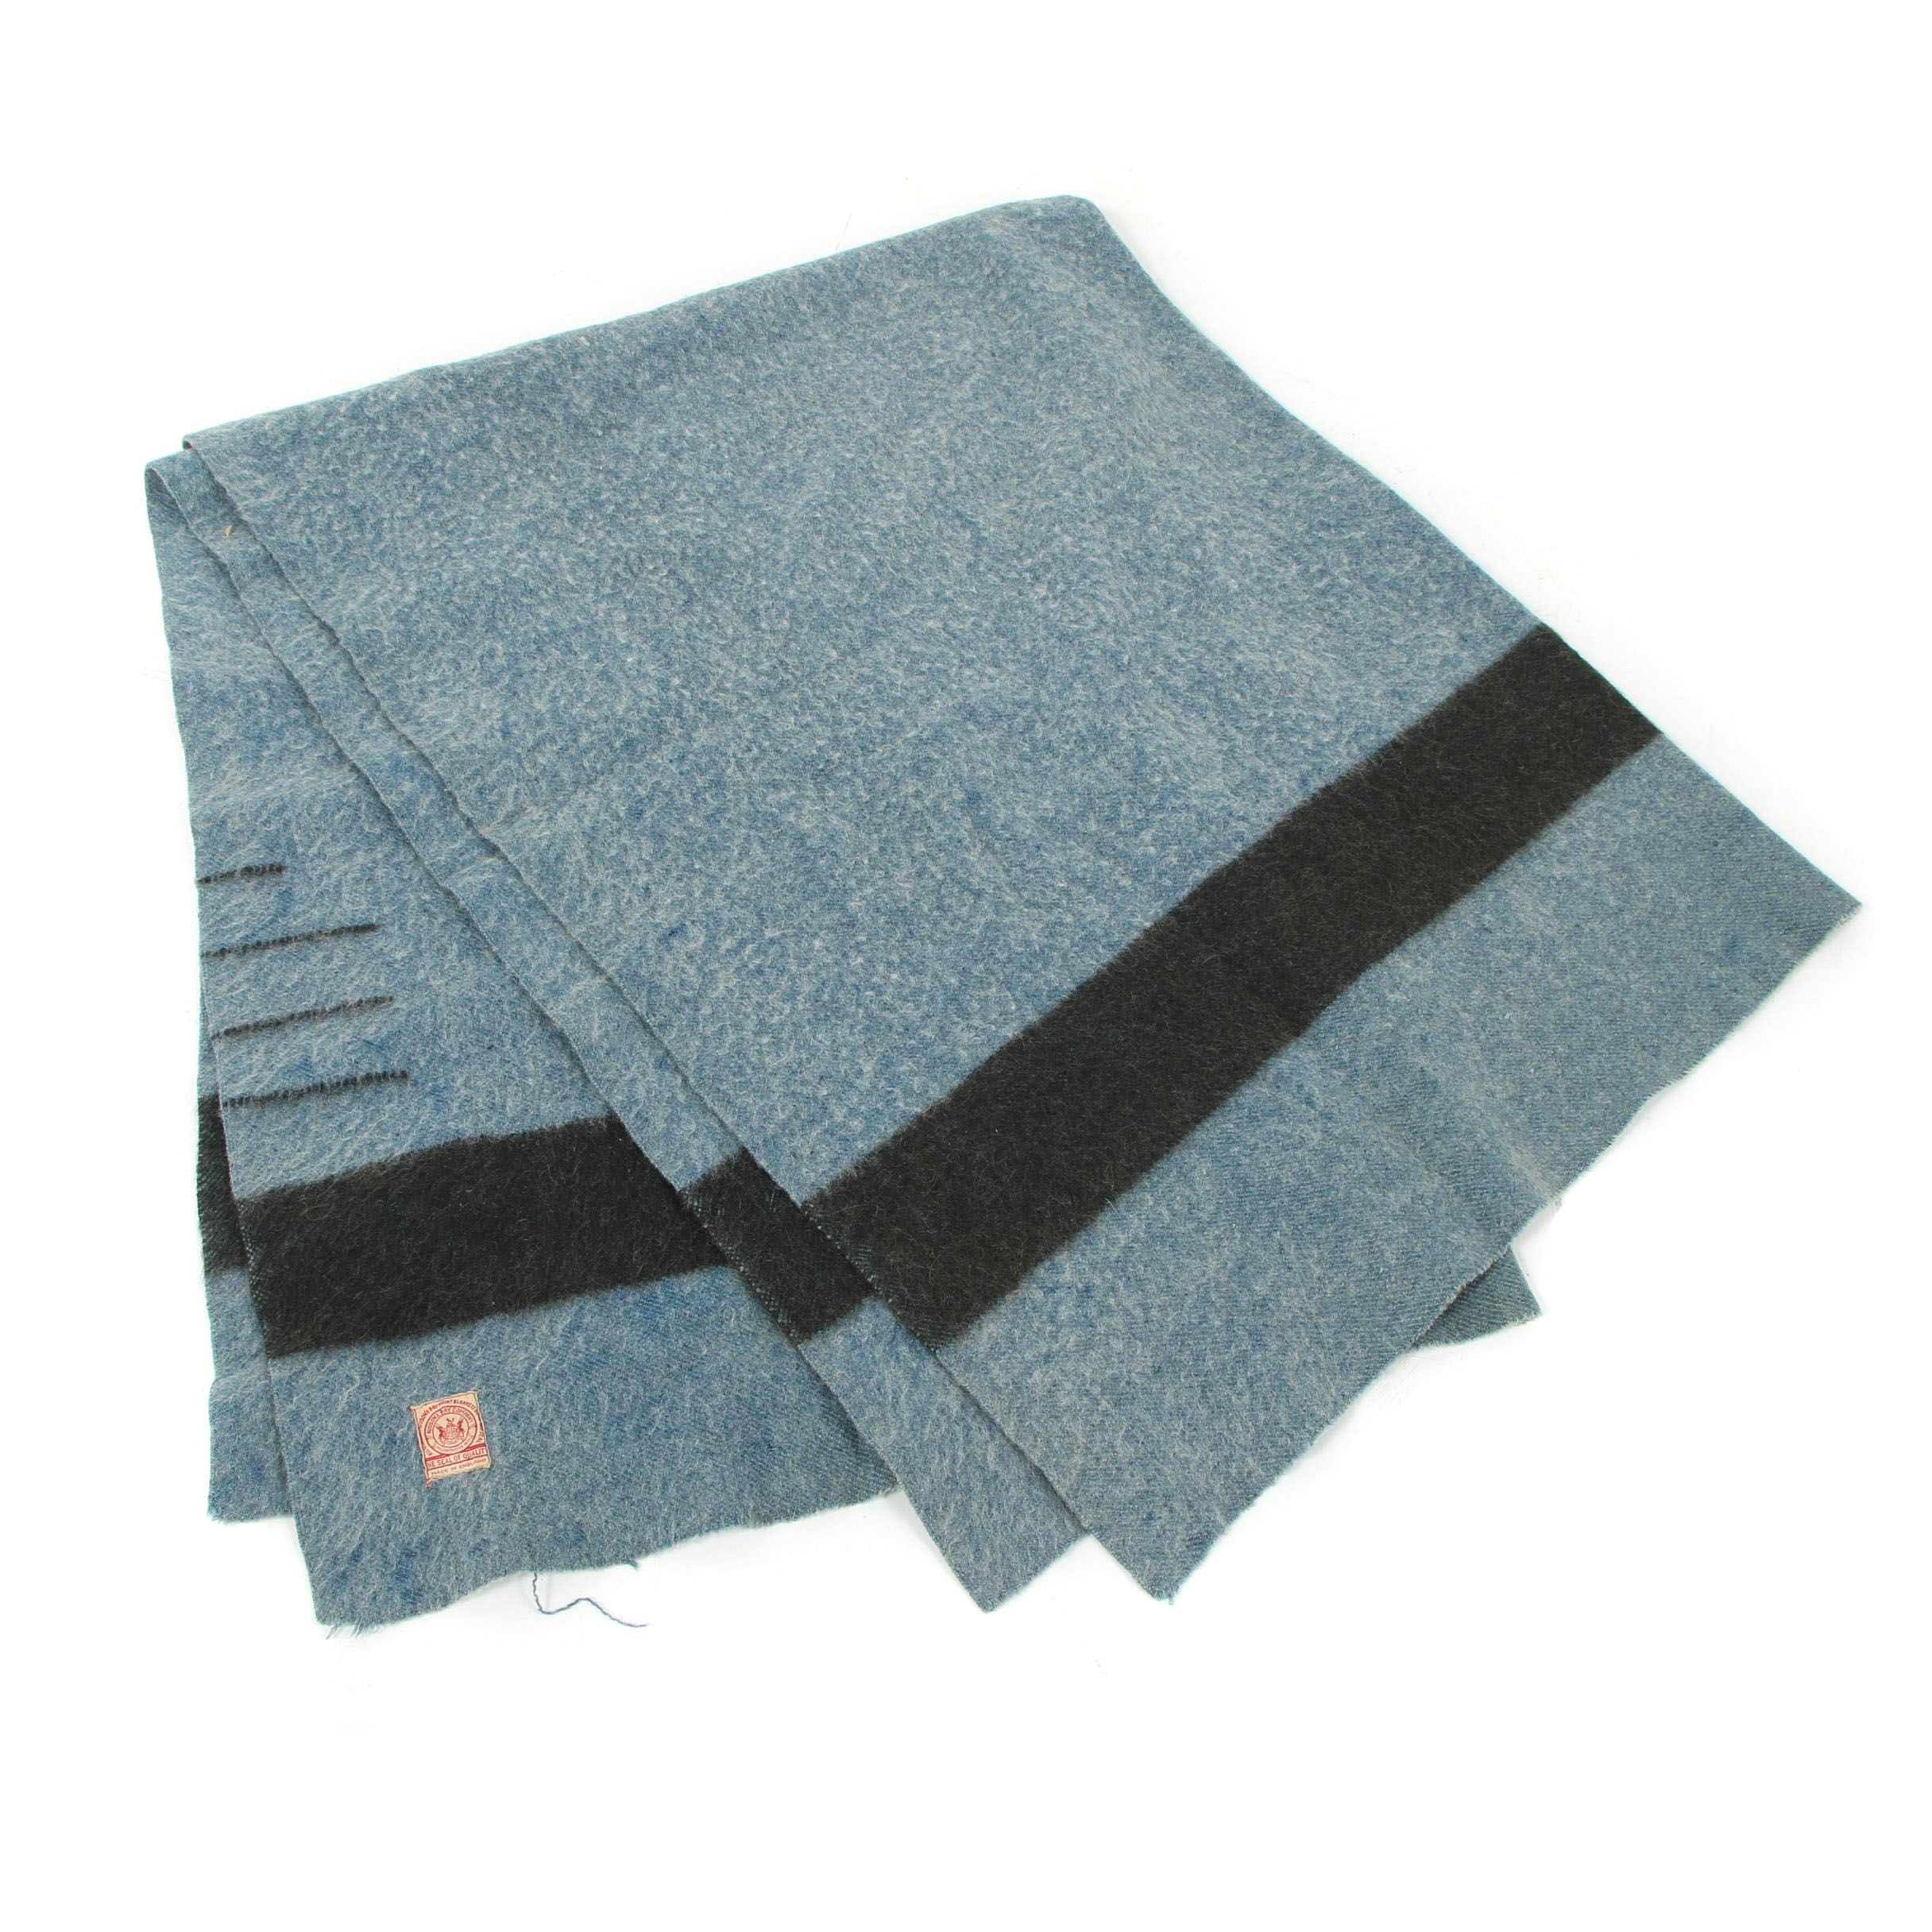 Hudson Bay Company Wool Blanket